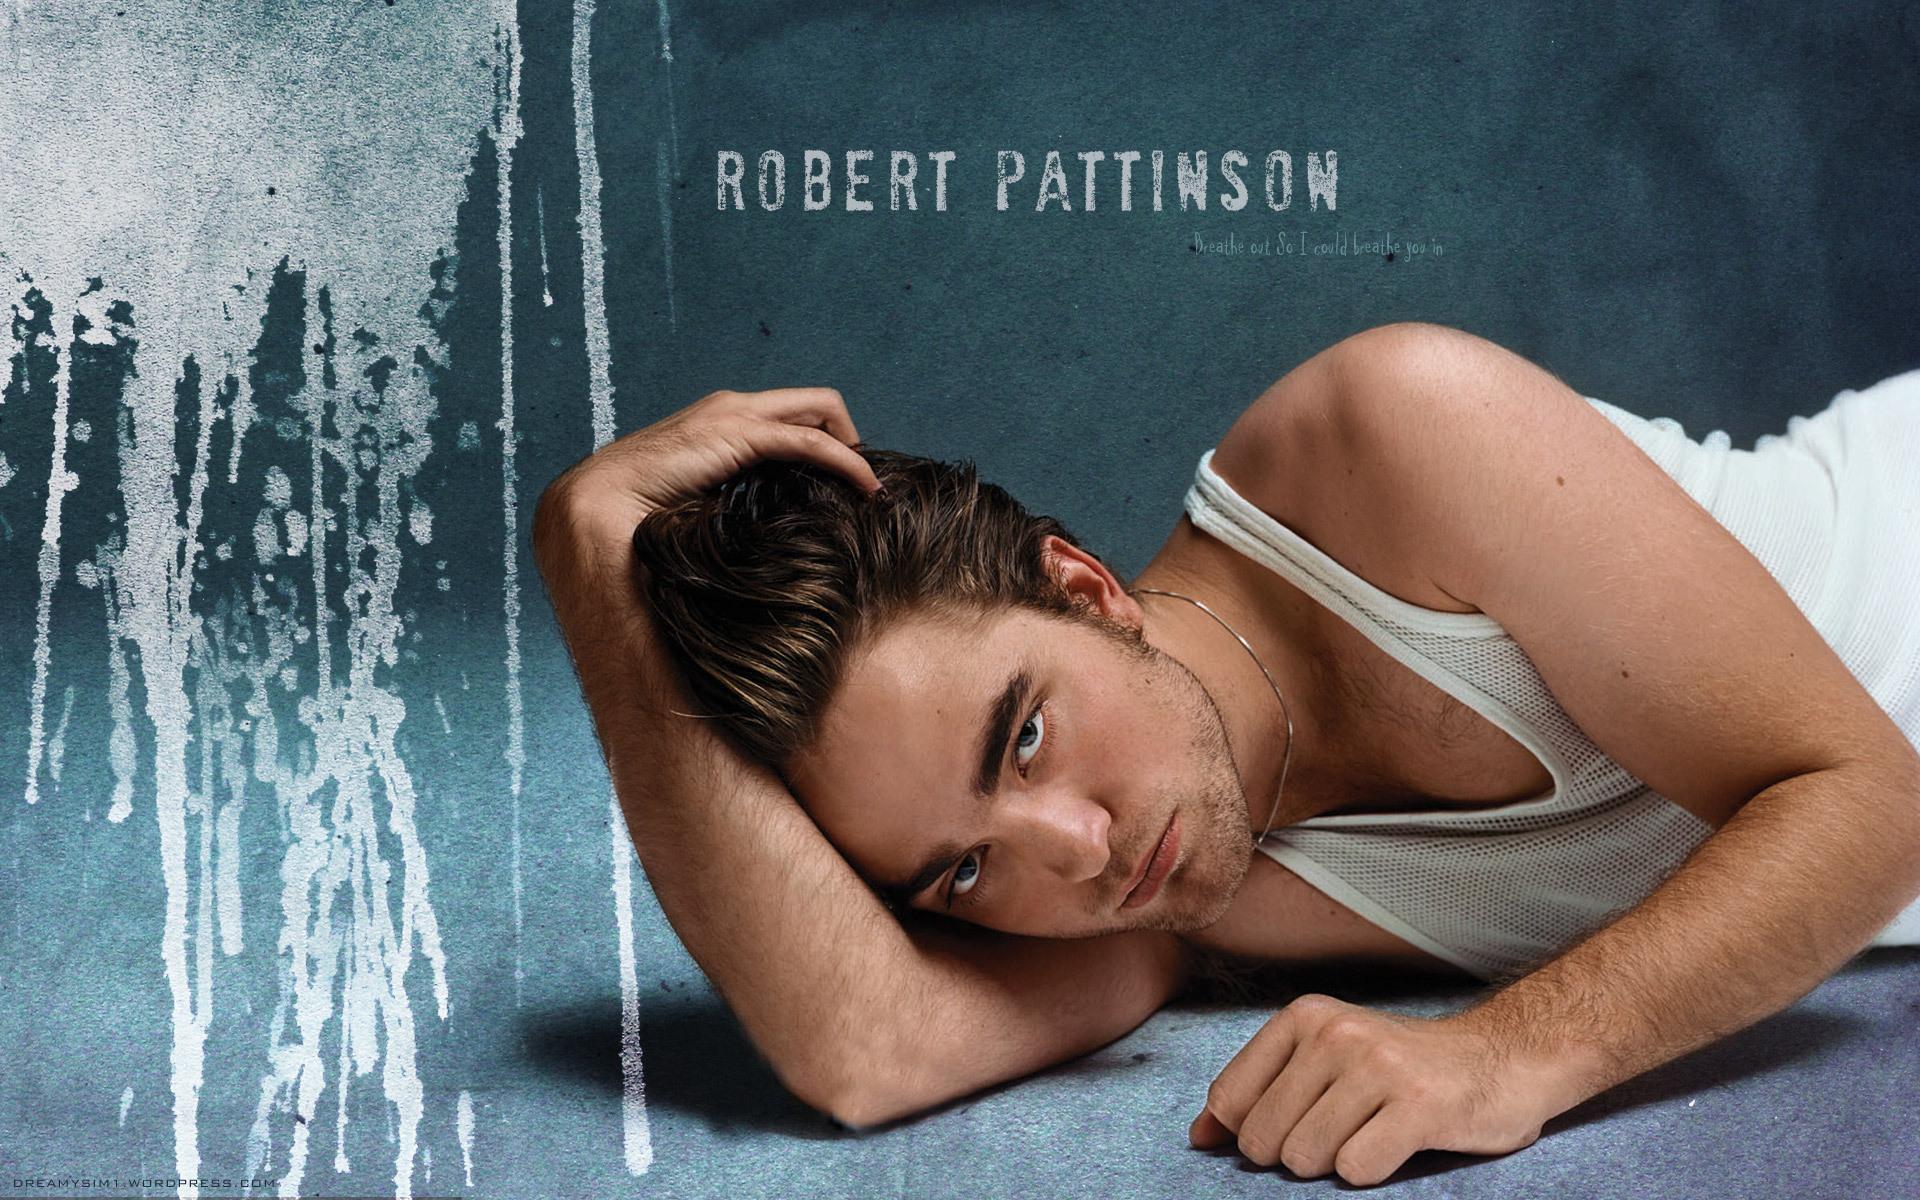 •♥• Robert Pattinson দেওয়ালপত্র •♥•